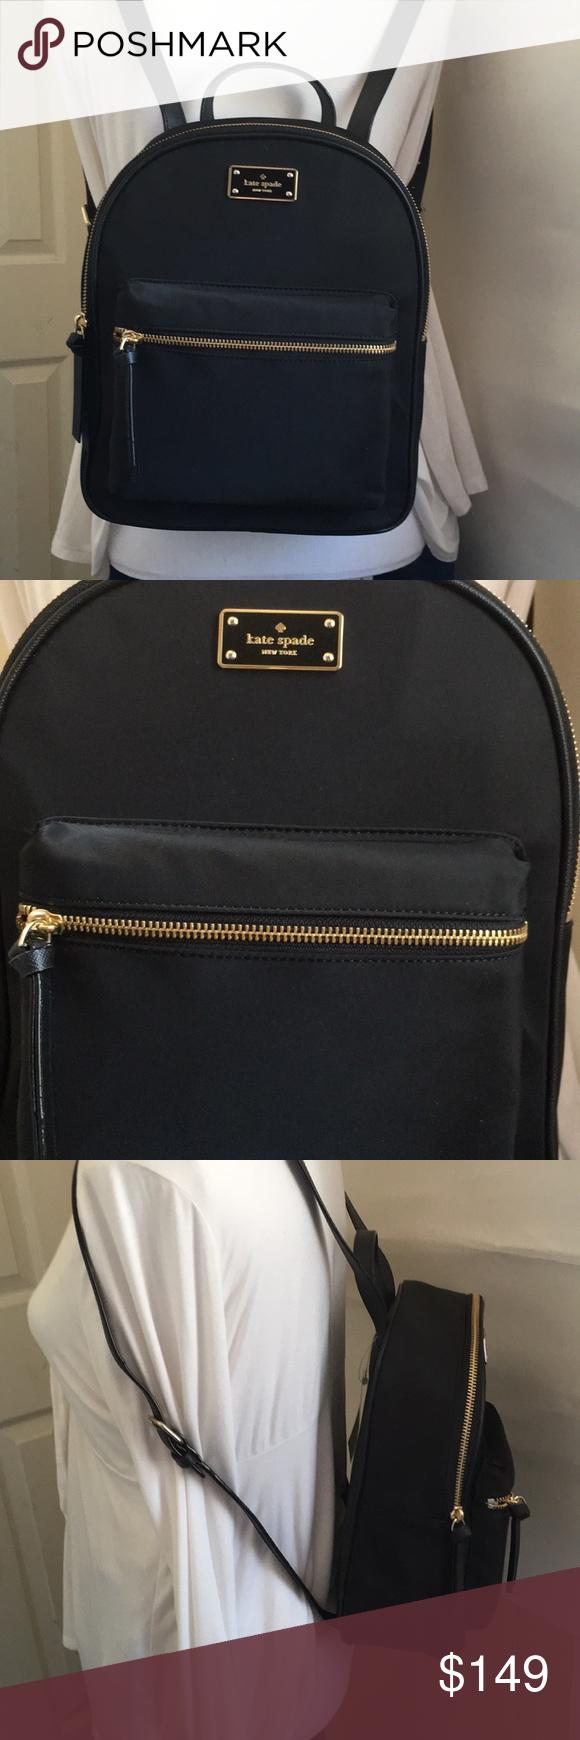 4507a86242a8 Kate spade small Bradley Wilson road backpack Brand new backpack kate spade  Bags Backpacks